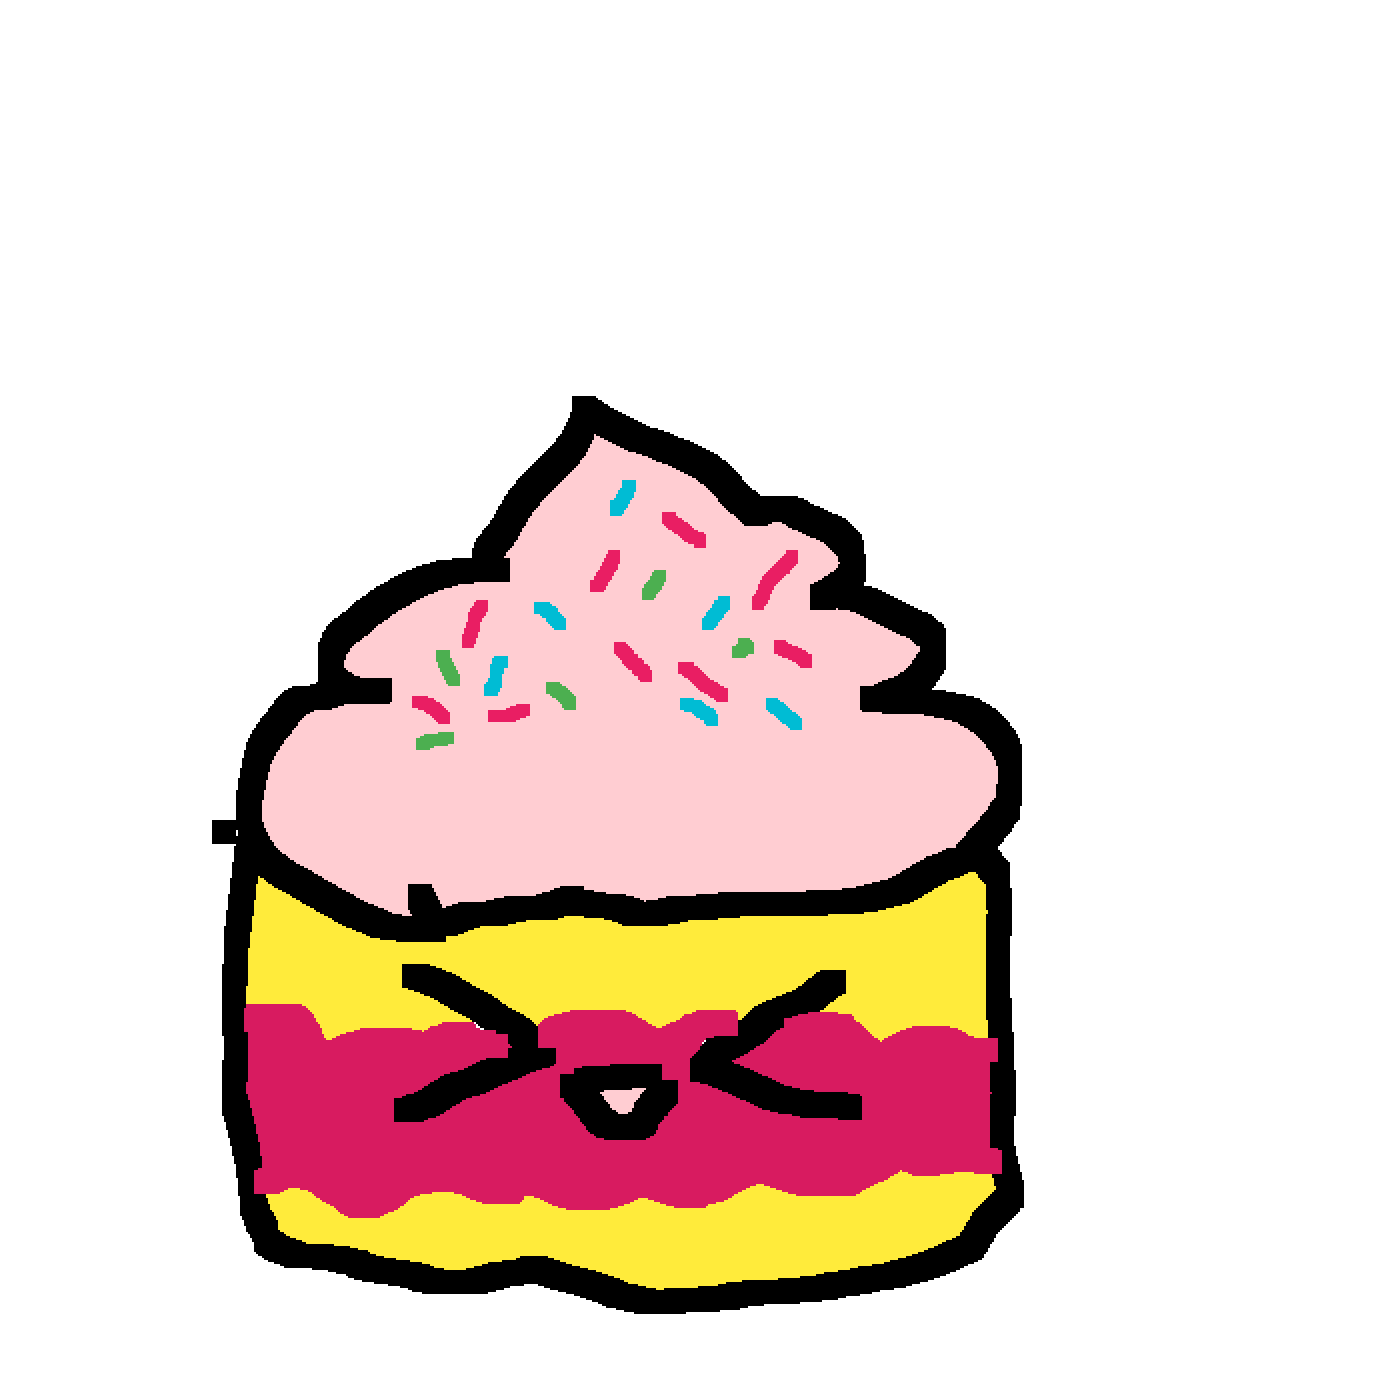 Pixilart Kawaii Ish Cupcake By Derpydrawing